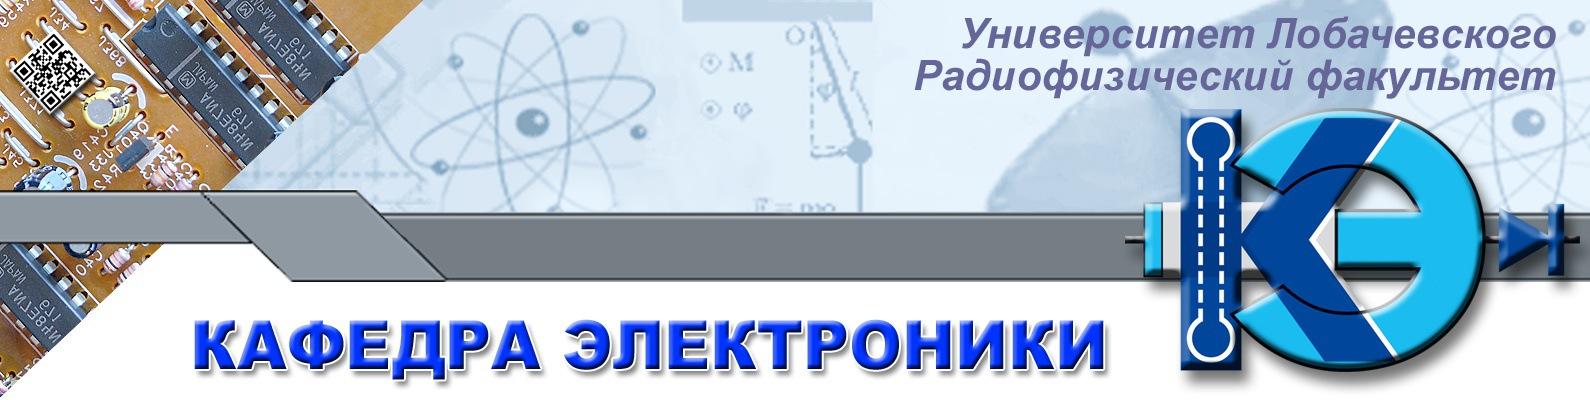 Кафедра электроники РФ ННГУ ВКонтакте